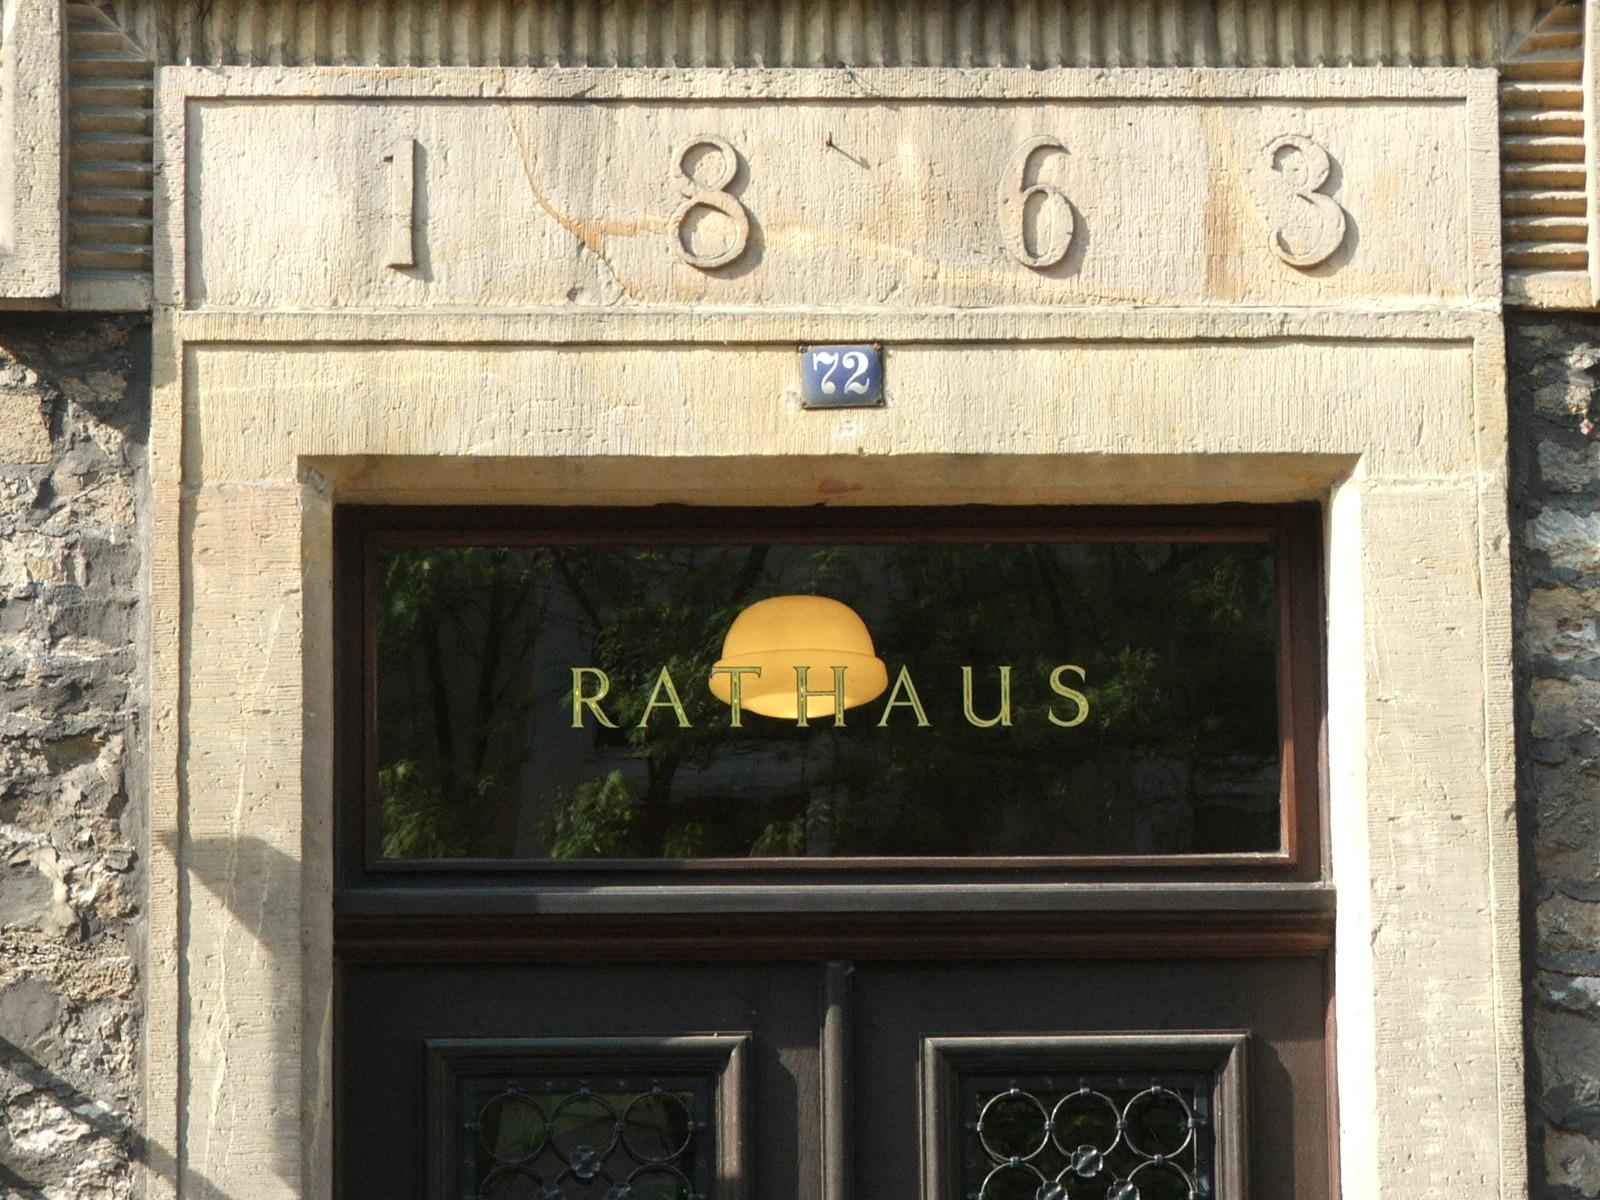 Rathaus Lage